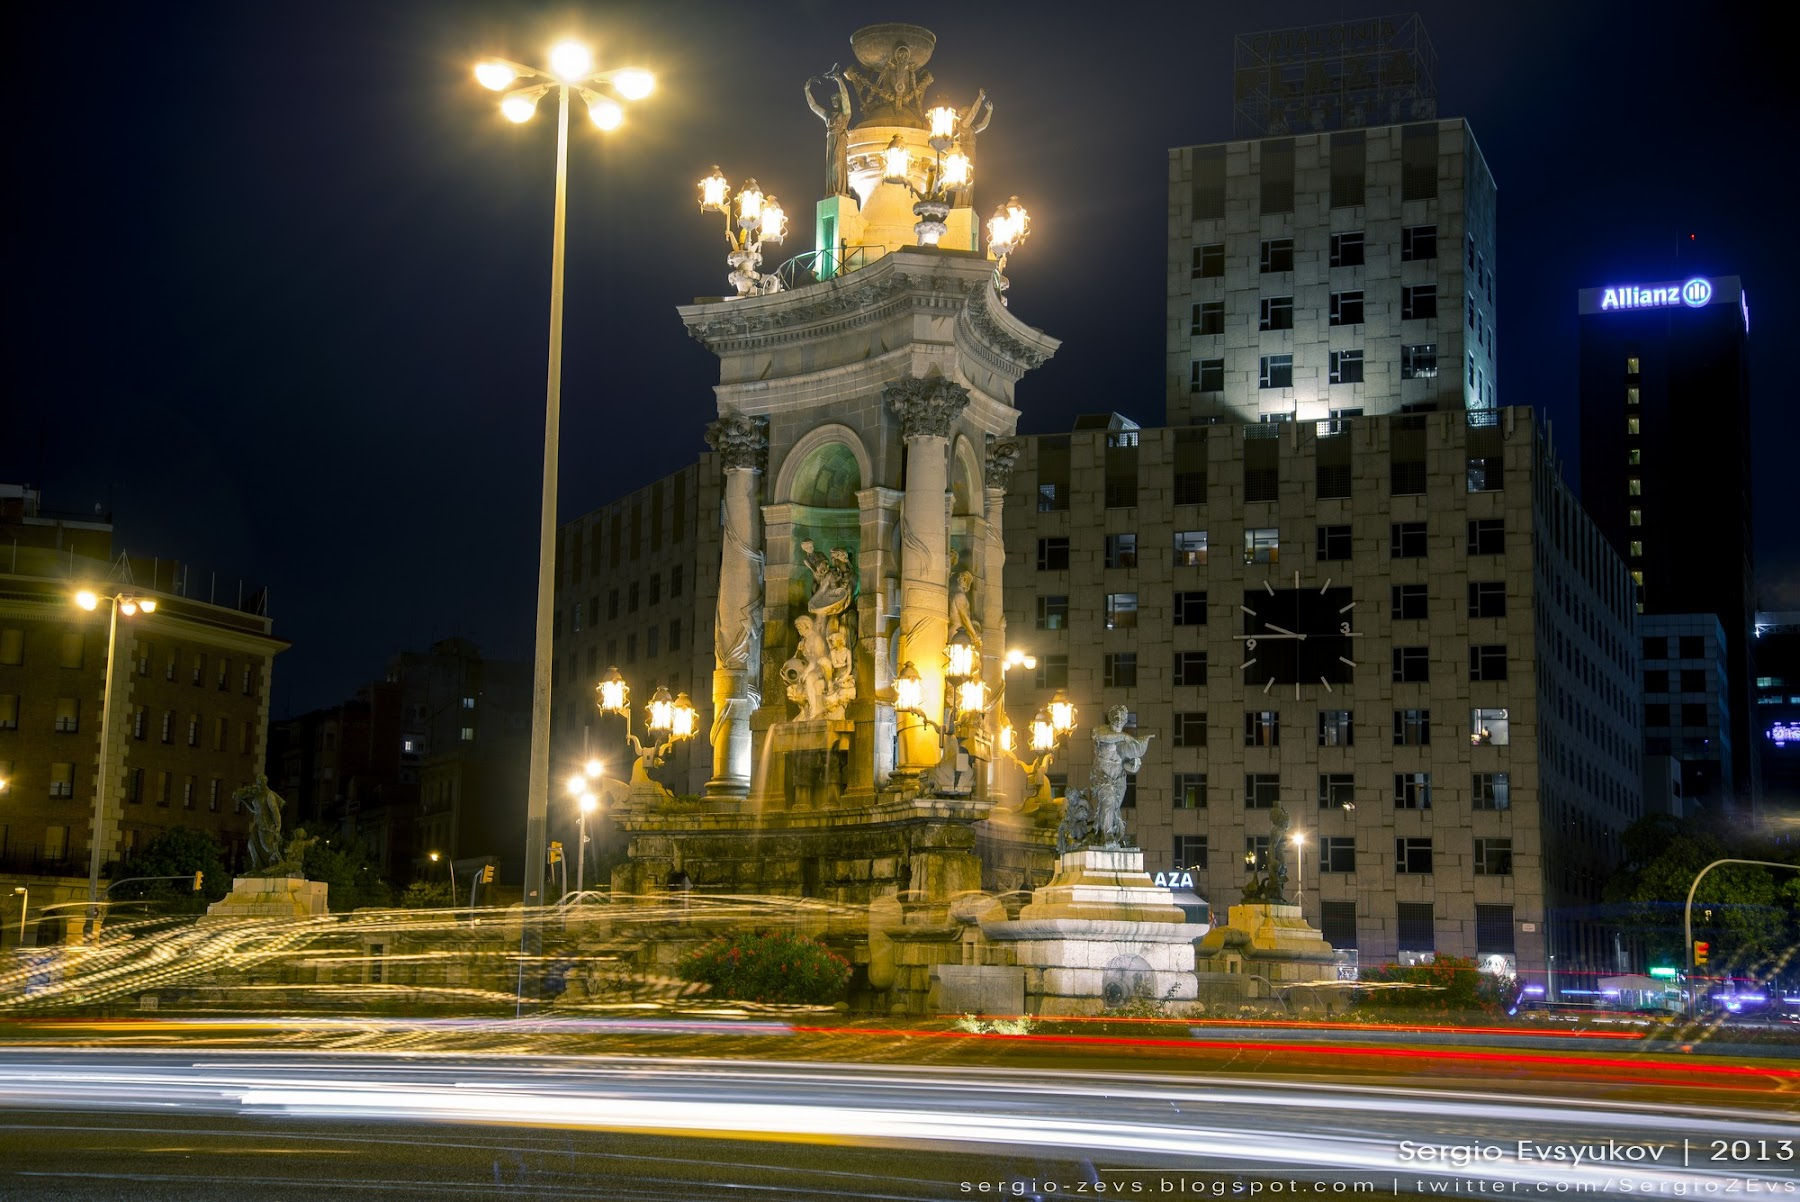 fountain by Josep Maria Jujol in Barcelona